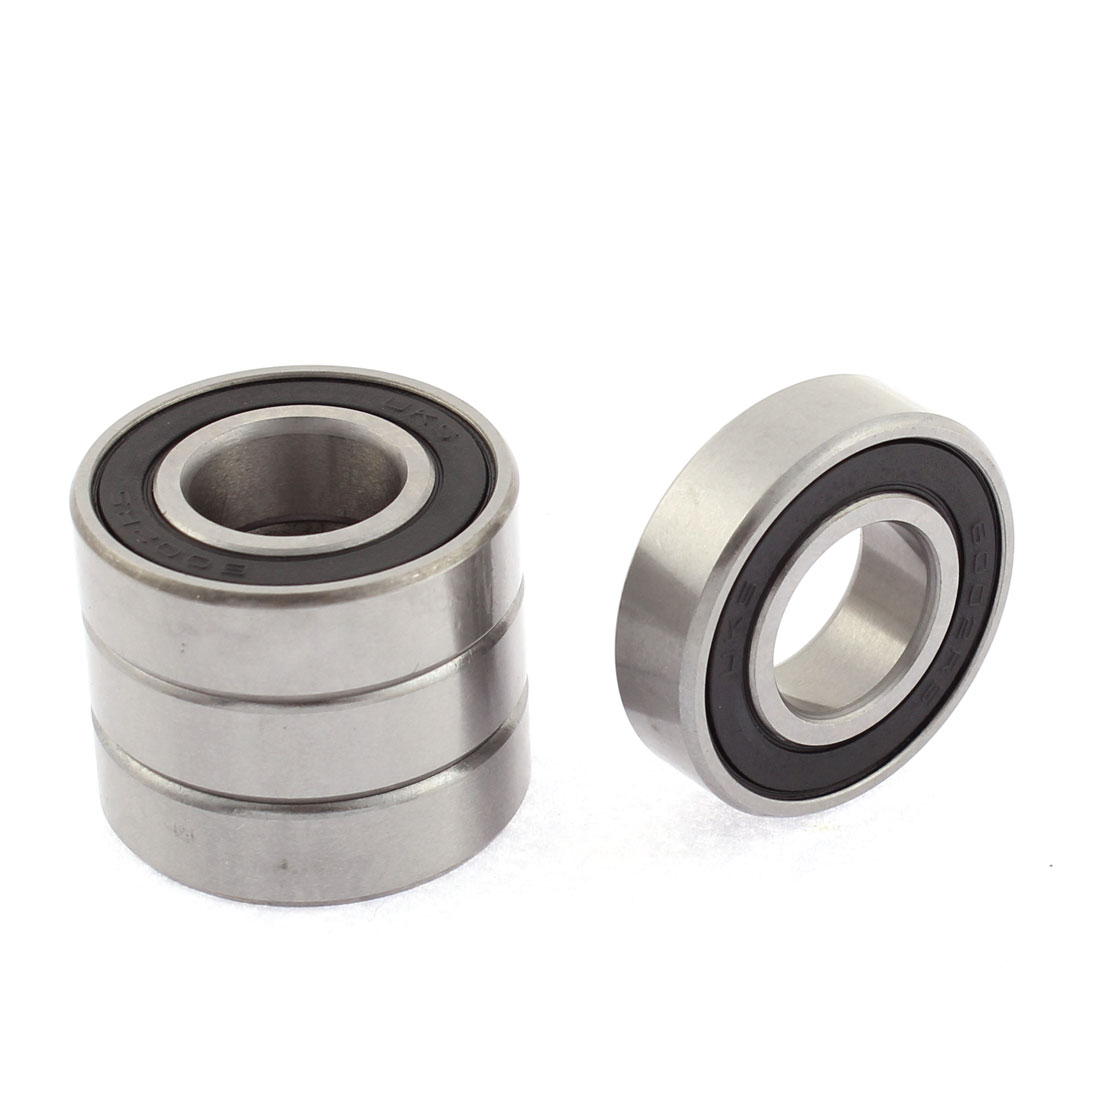 6002RS Dual Side Seals Deep Groove Bearing Ball 15mm Inner Dia 4pcs